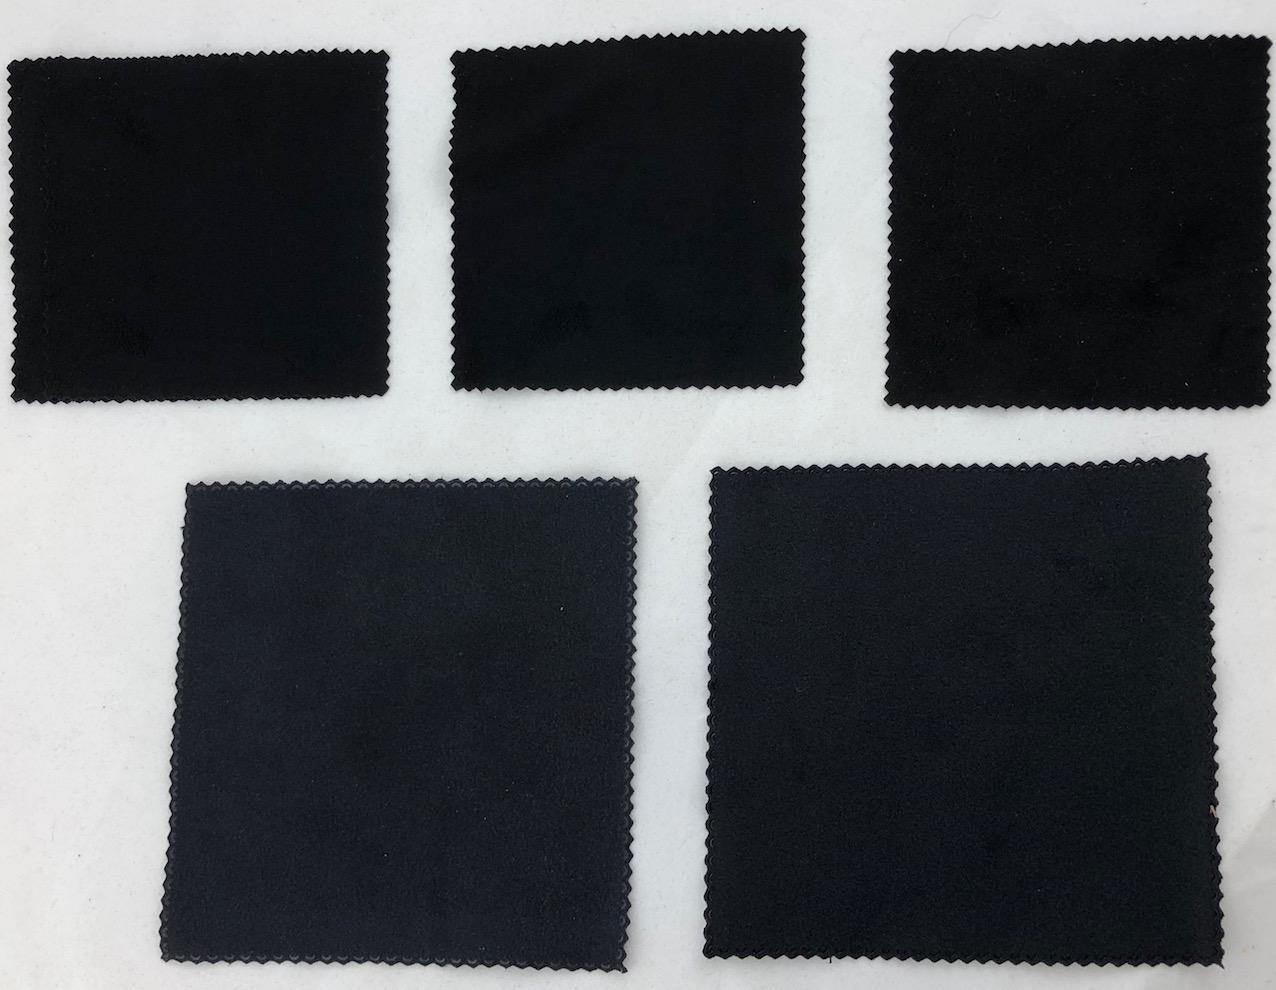 Medium size polishing cloths 13cmx13cm